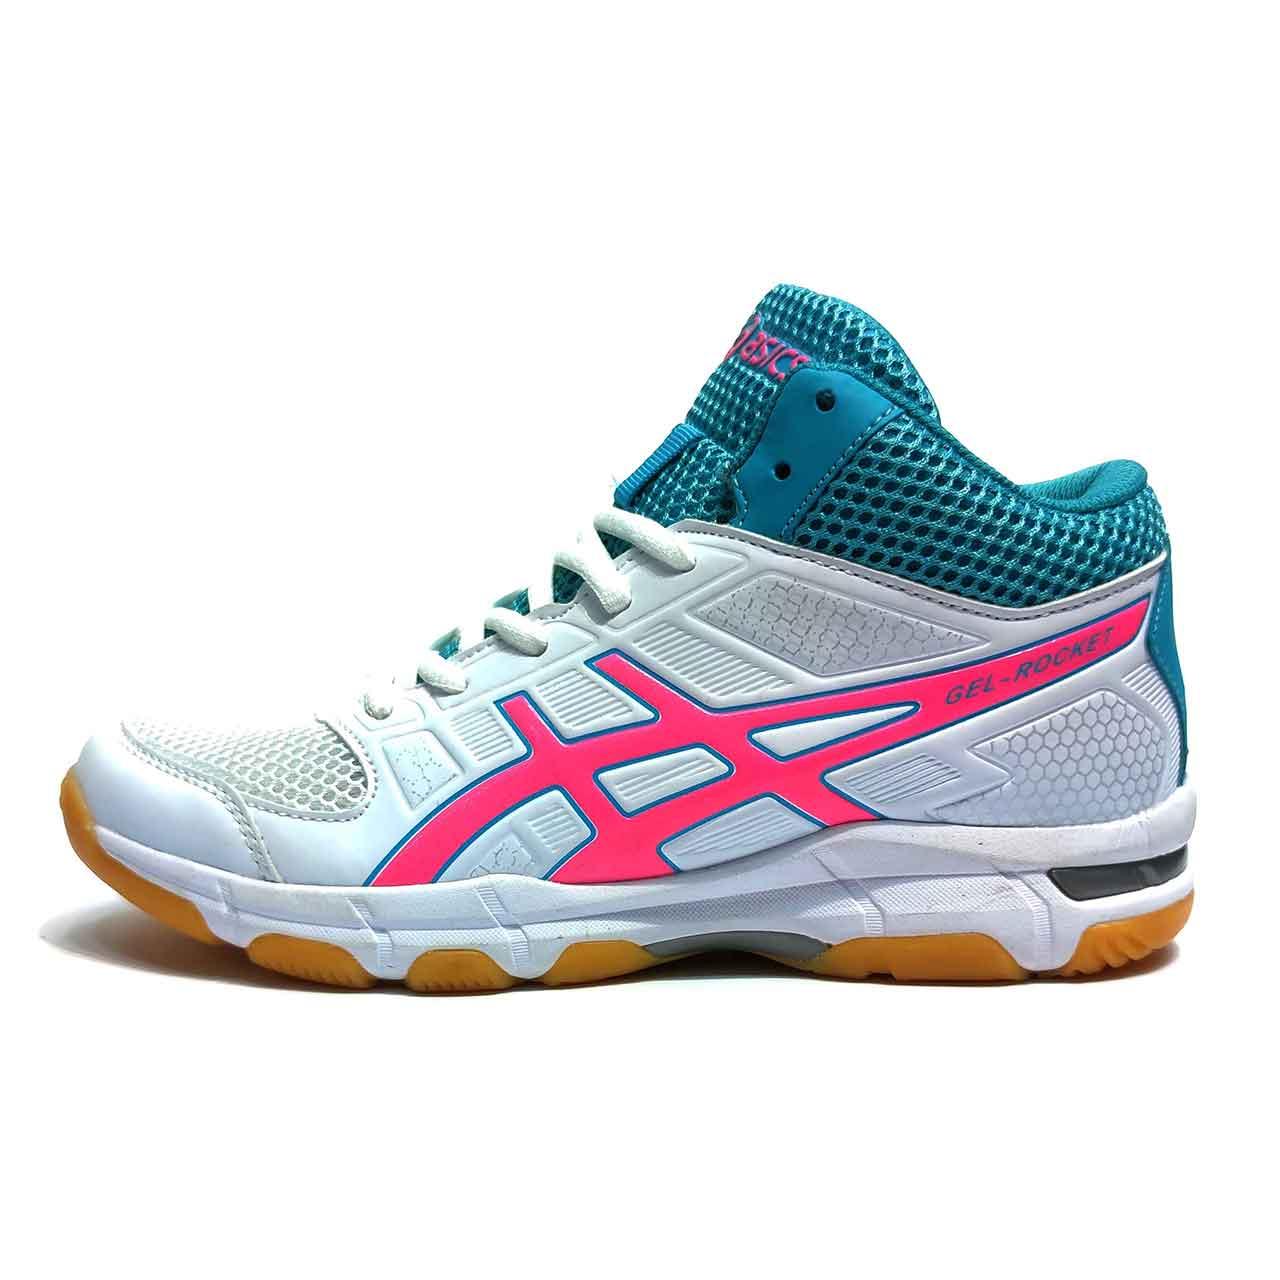 کفش والیبال آسیکس زنانه مدل Asics GEL ROCKET 8MT